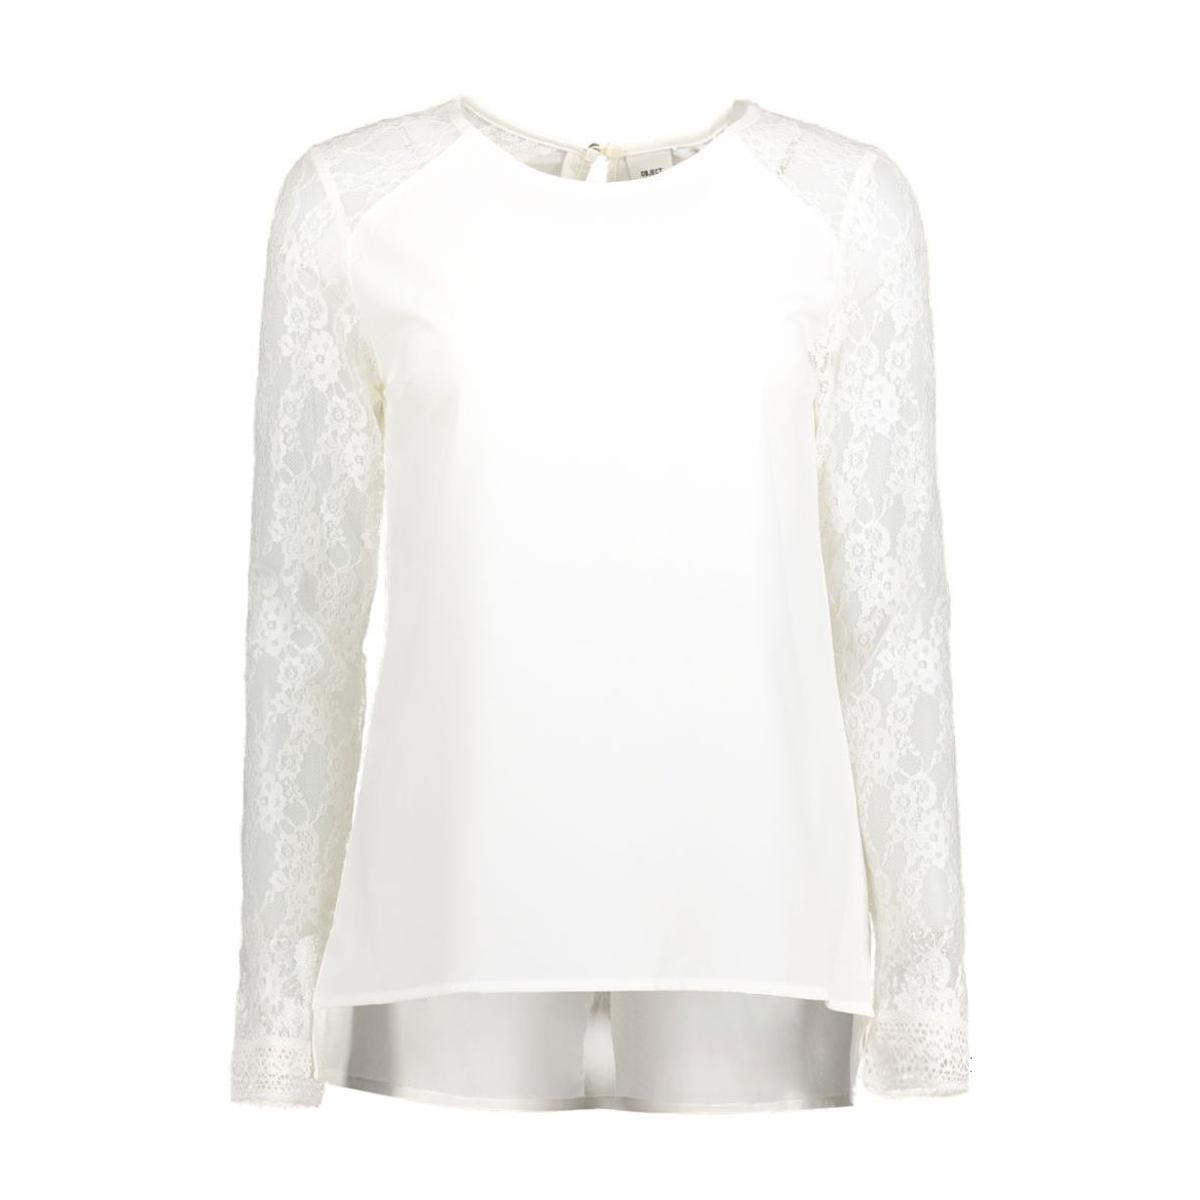 objcam l/s top campaign 23022652 object t-shirt gardenia